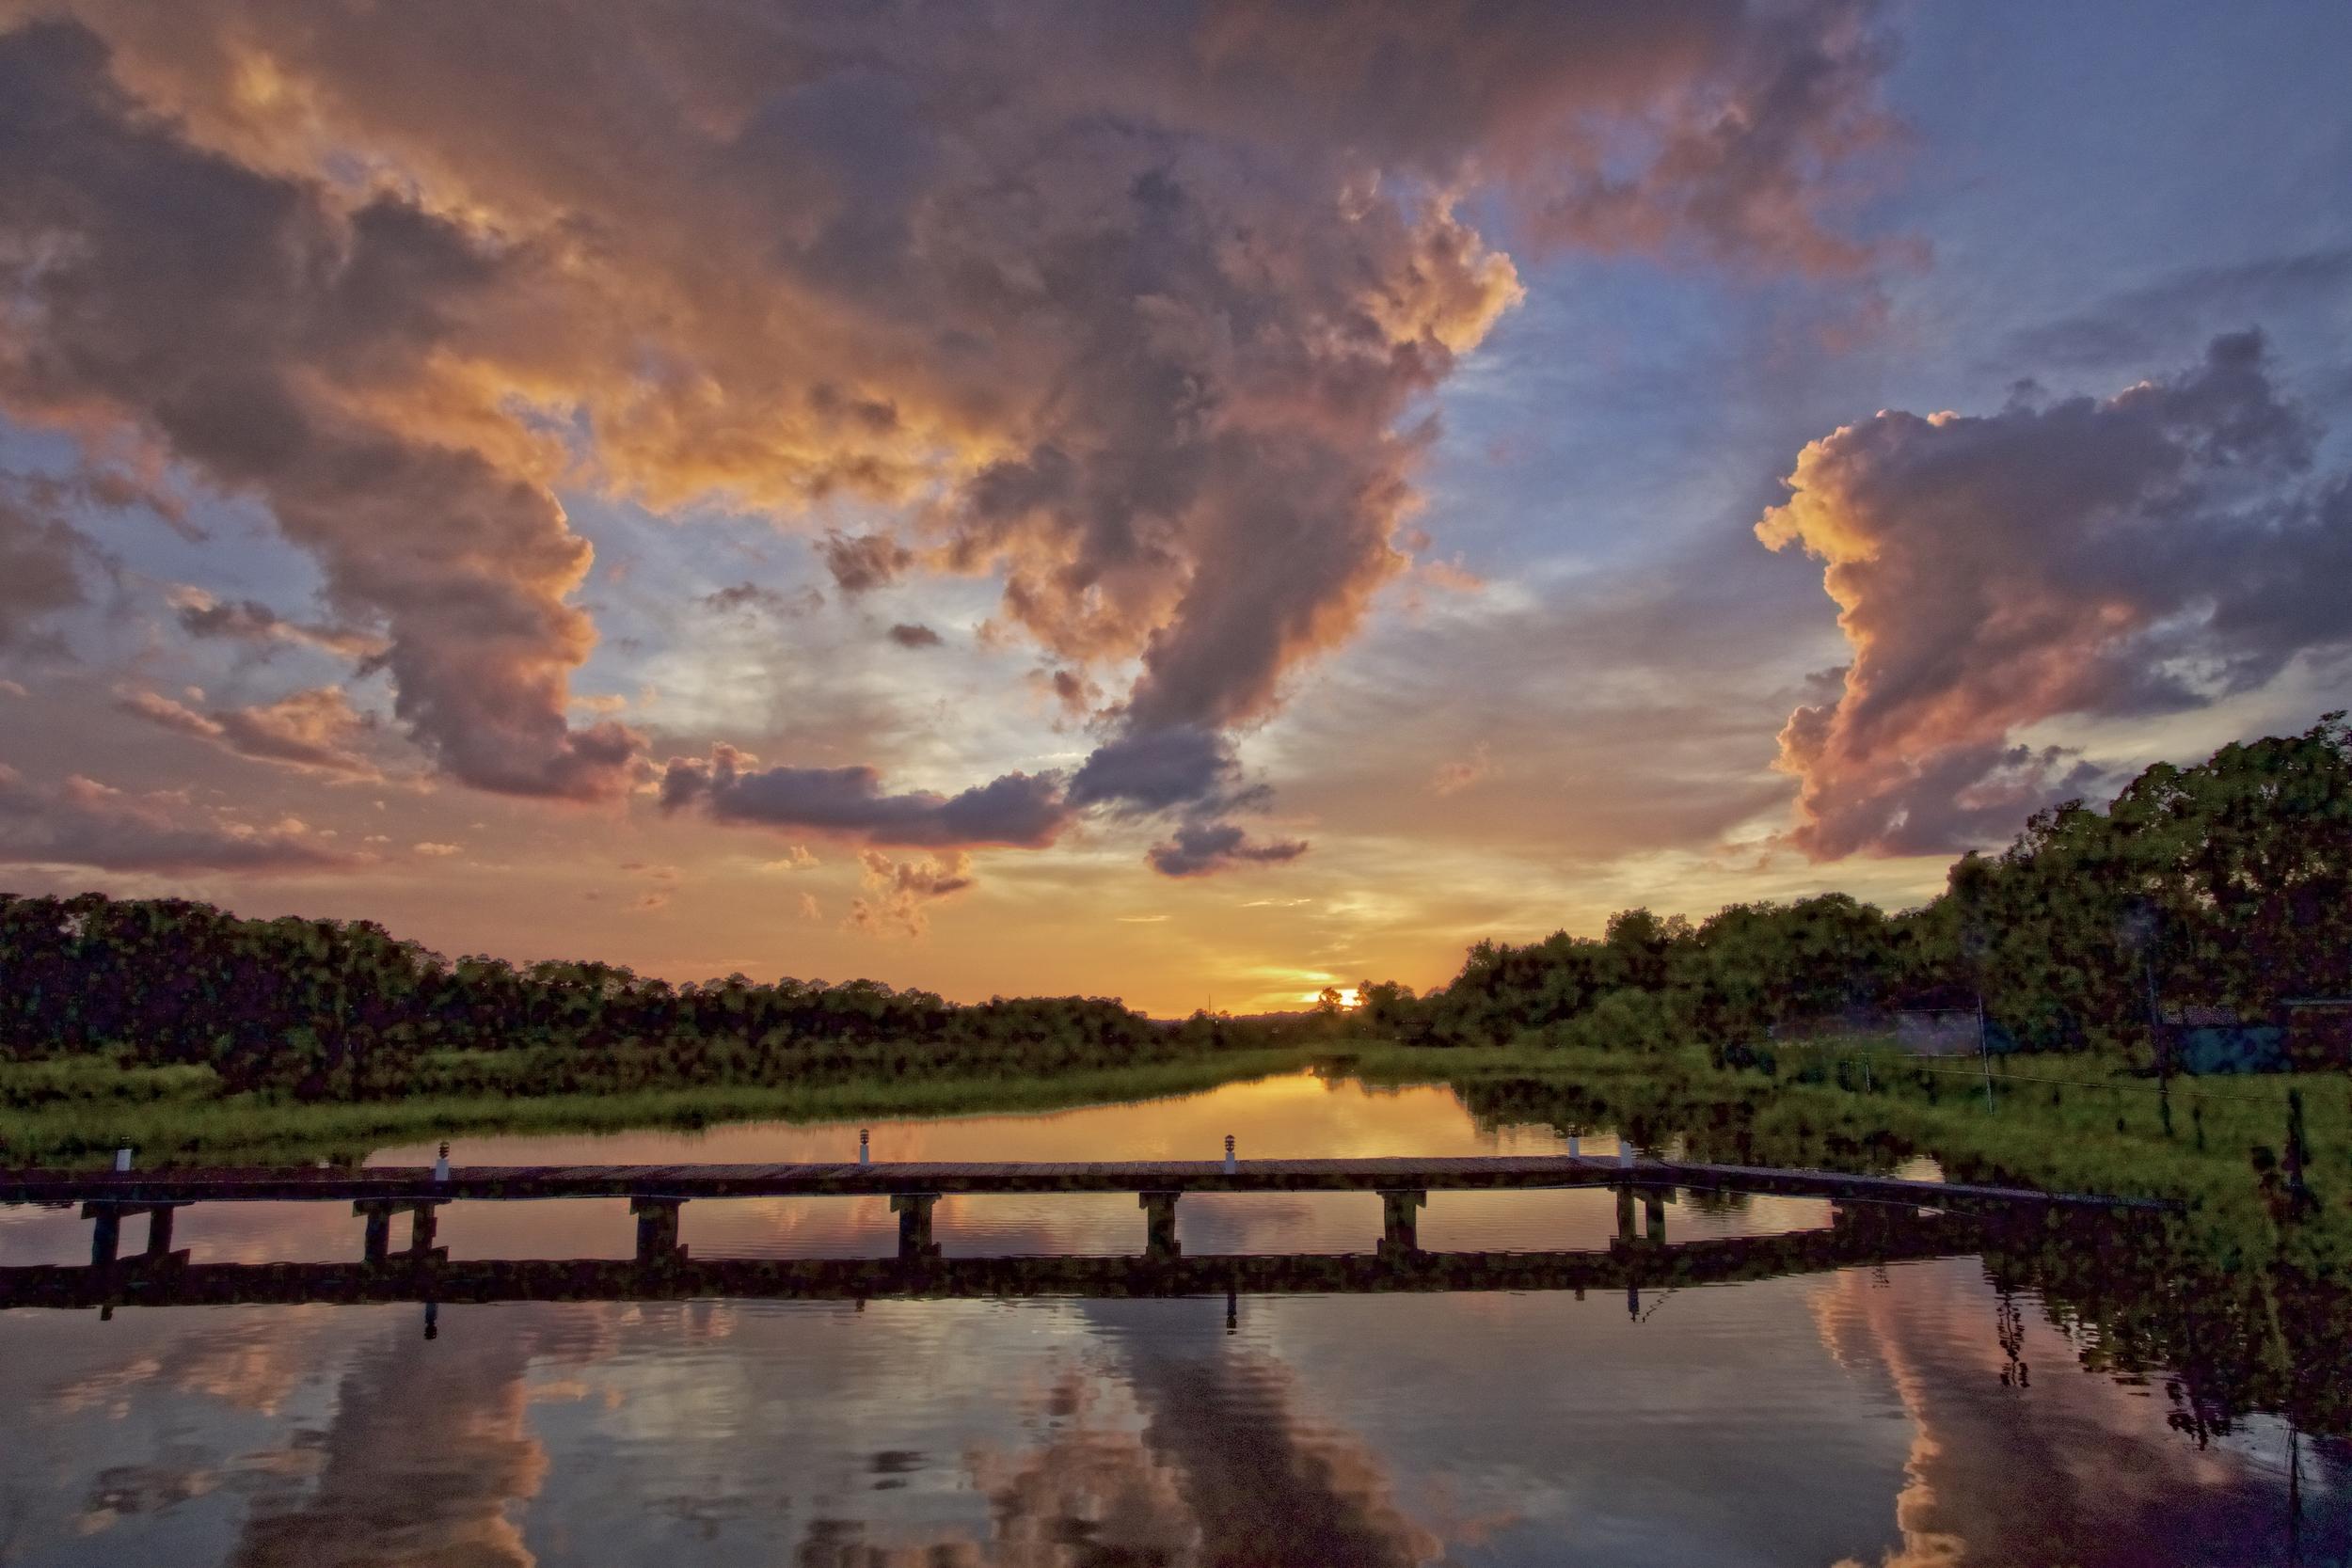 Sunset on the Broward...got happy feet now?